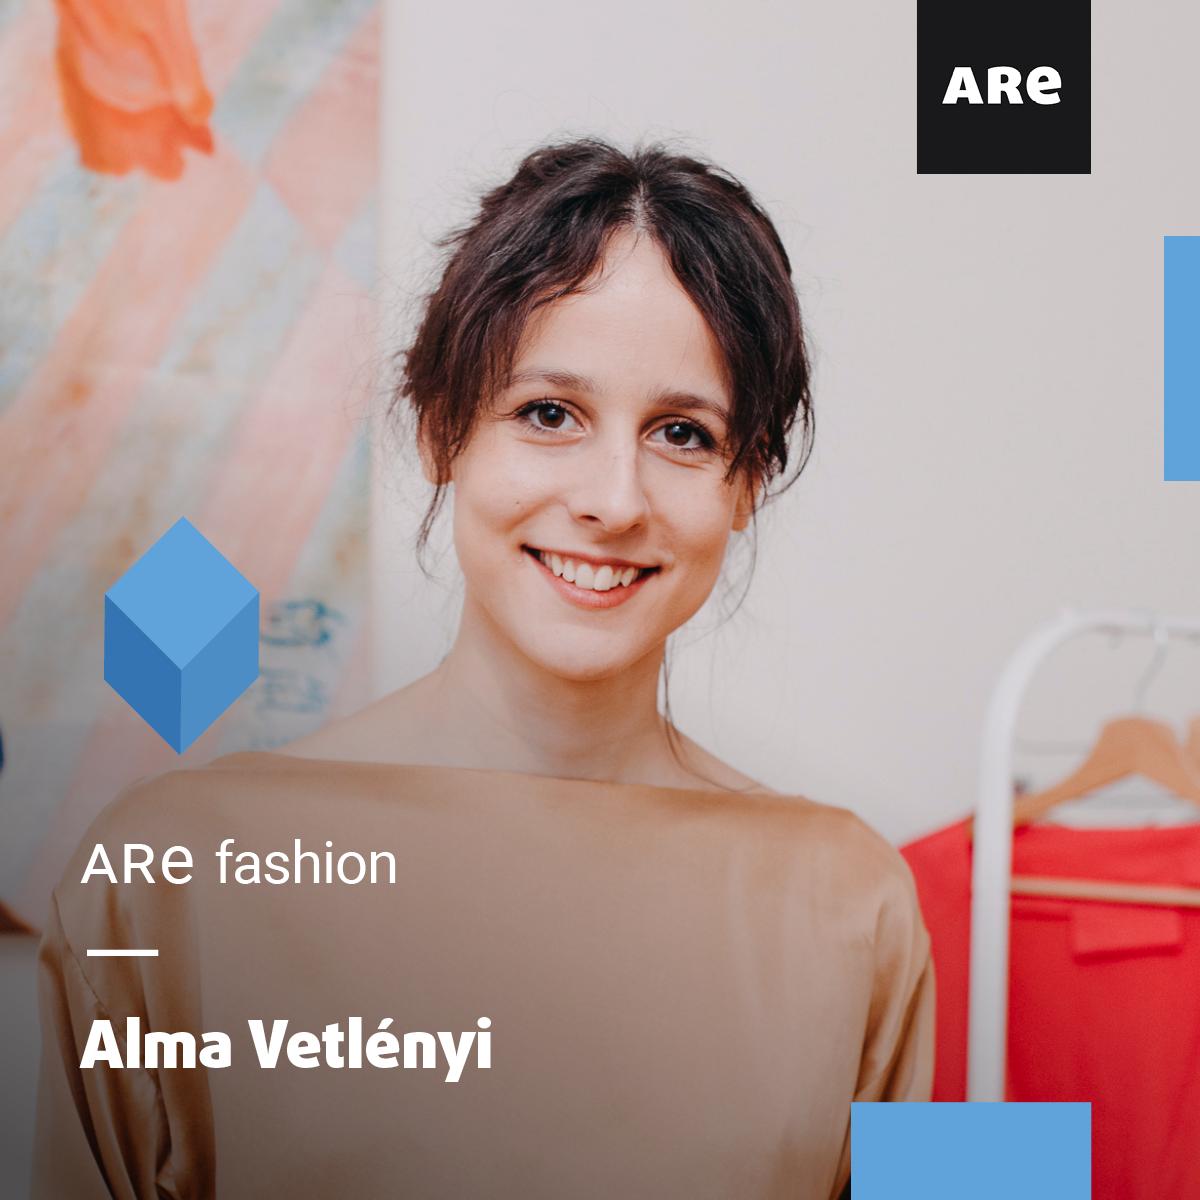 are_app-vetlenyi-alma